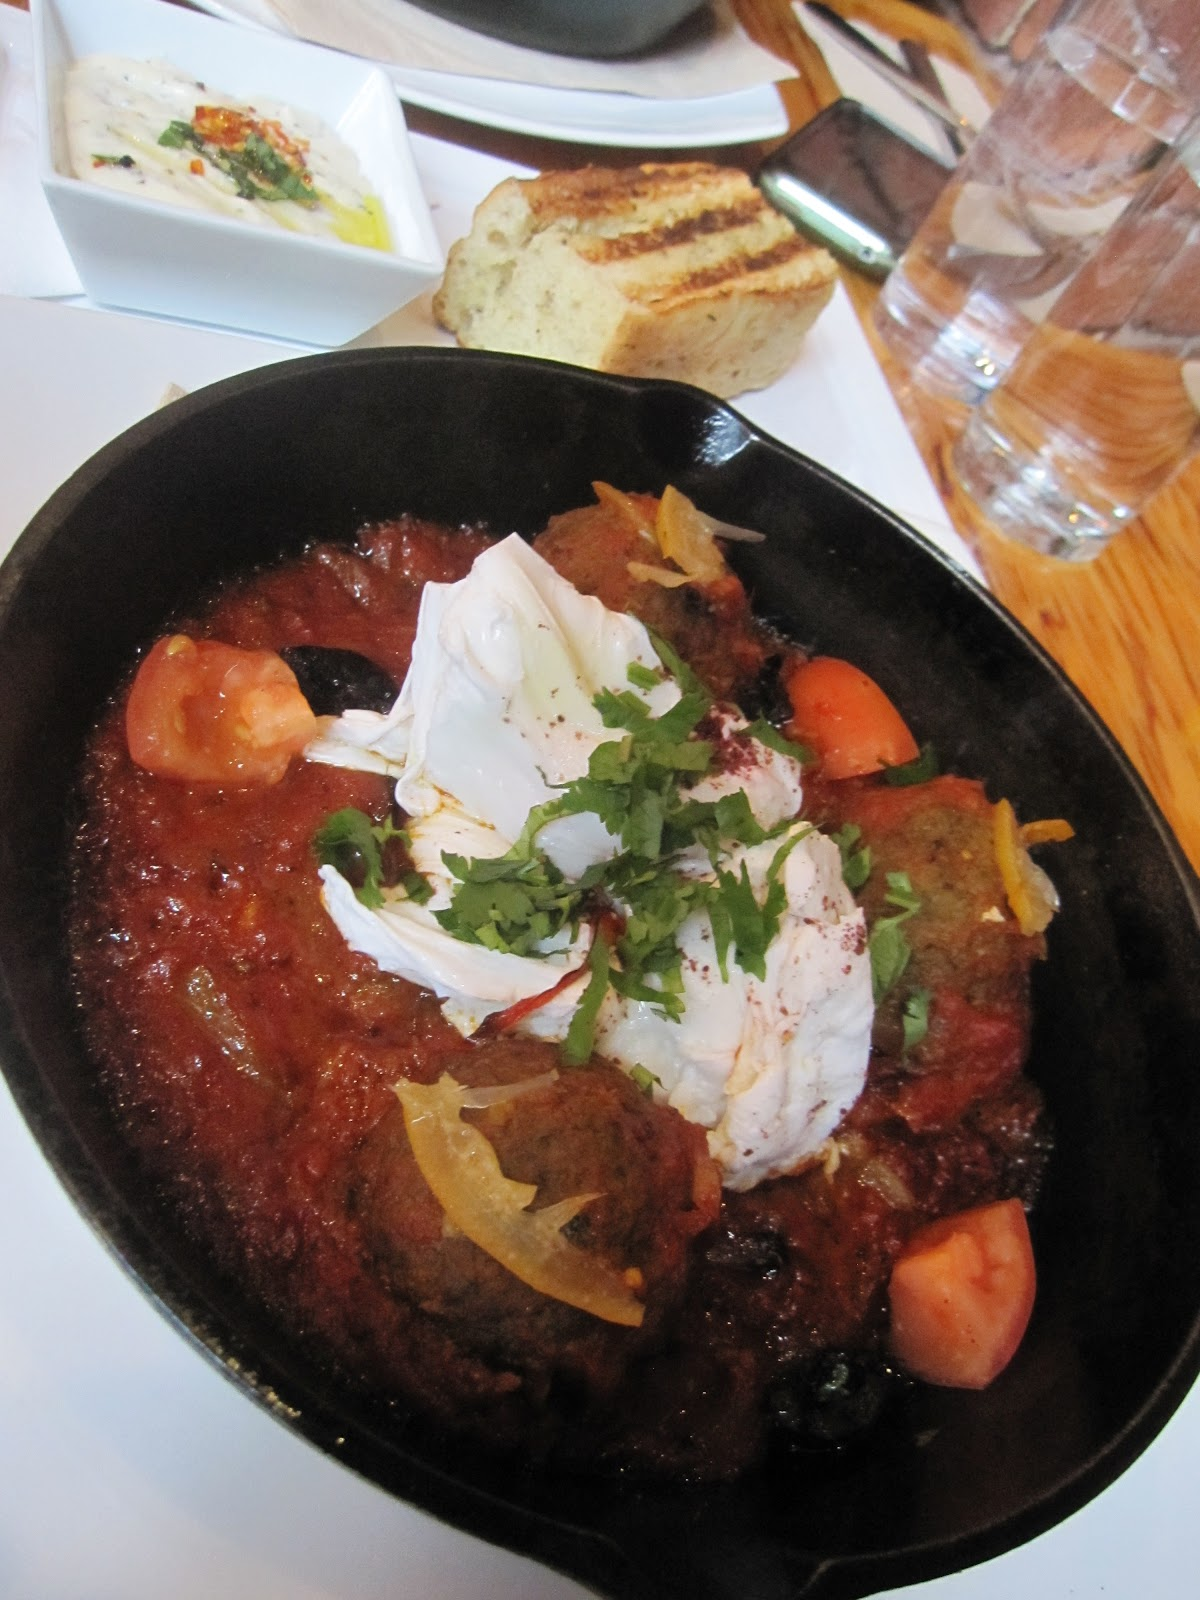 ... lamb and beef meatballs, cilantro, houmus, raita. Grilled foccacia. ($